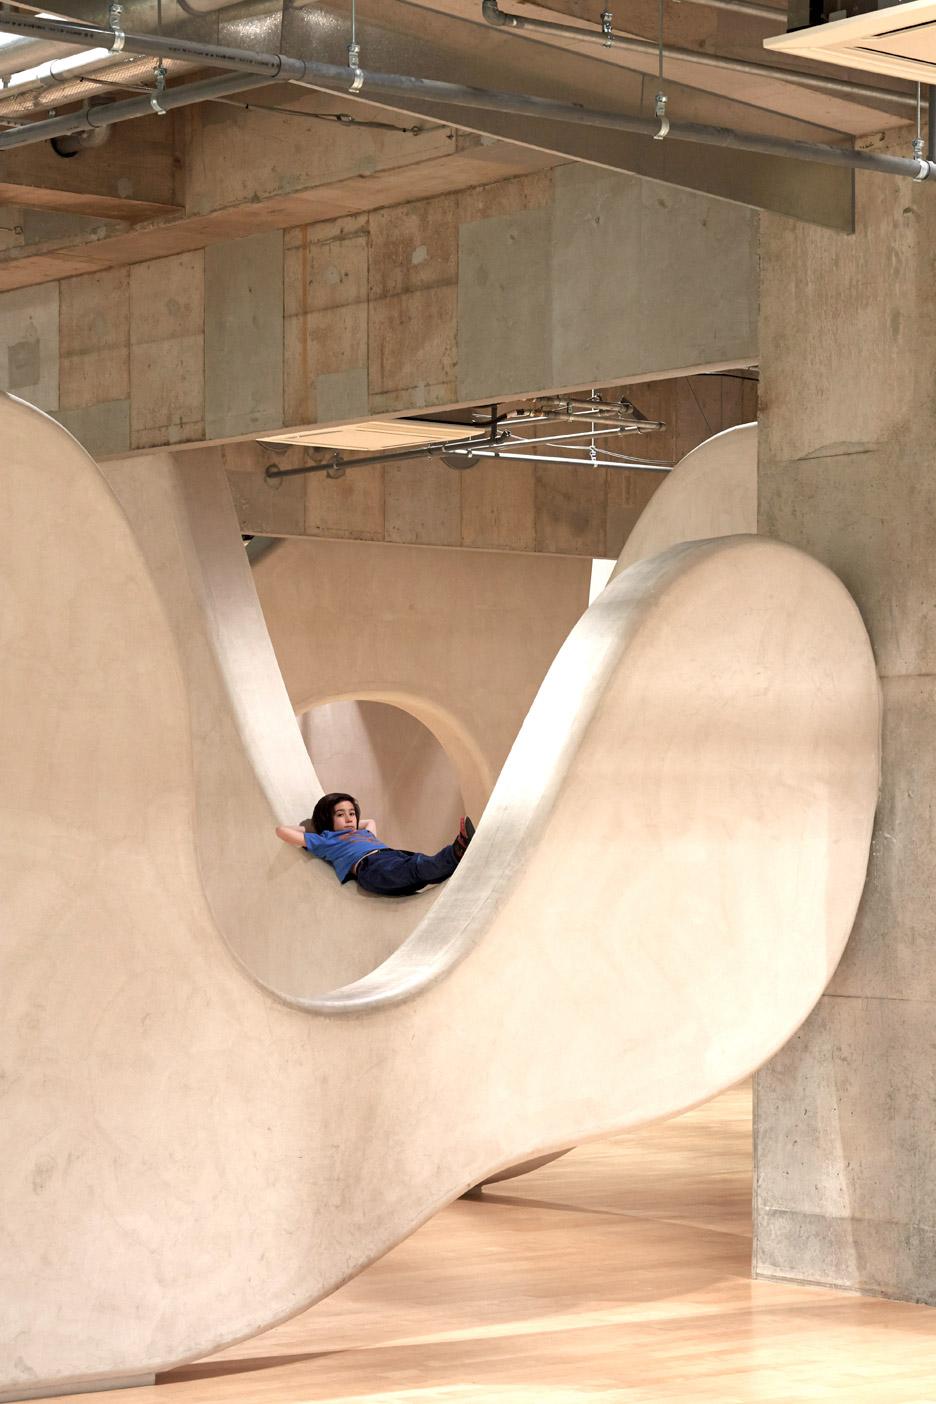 Junya Ishigami creates nursery with cloud-shaped walls inside a high-rise block